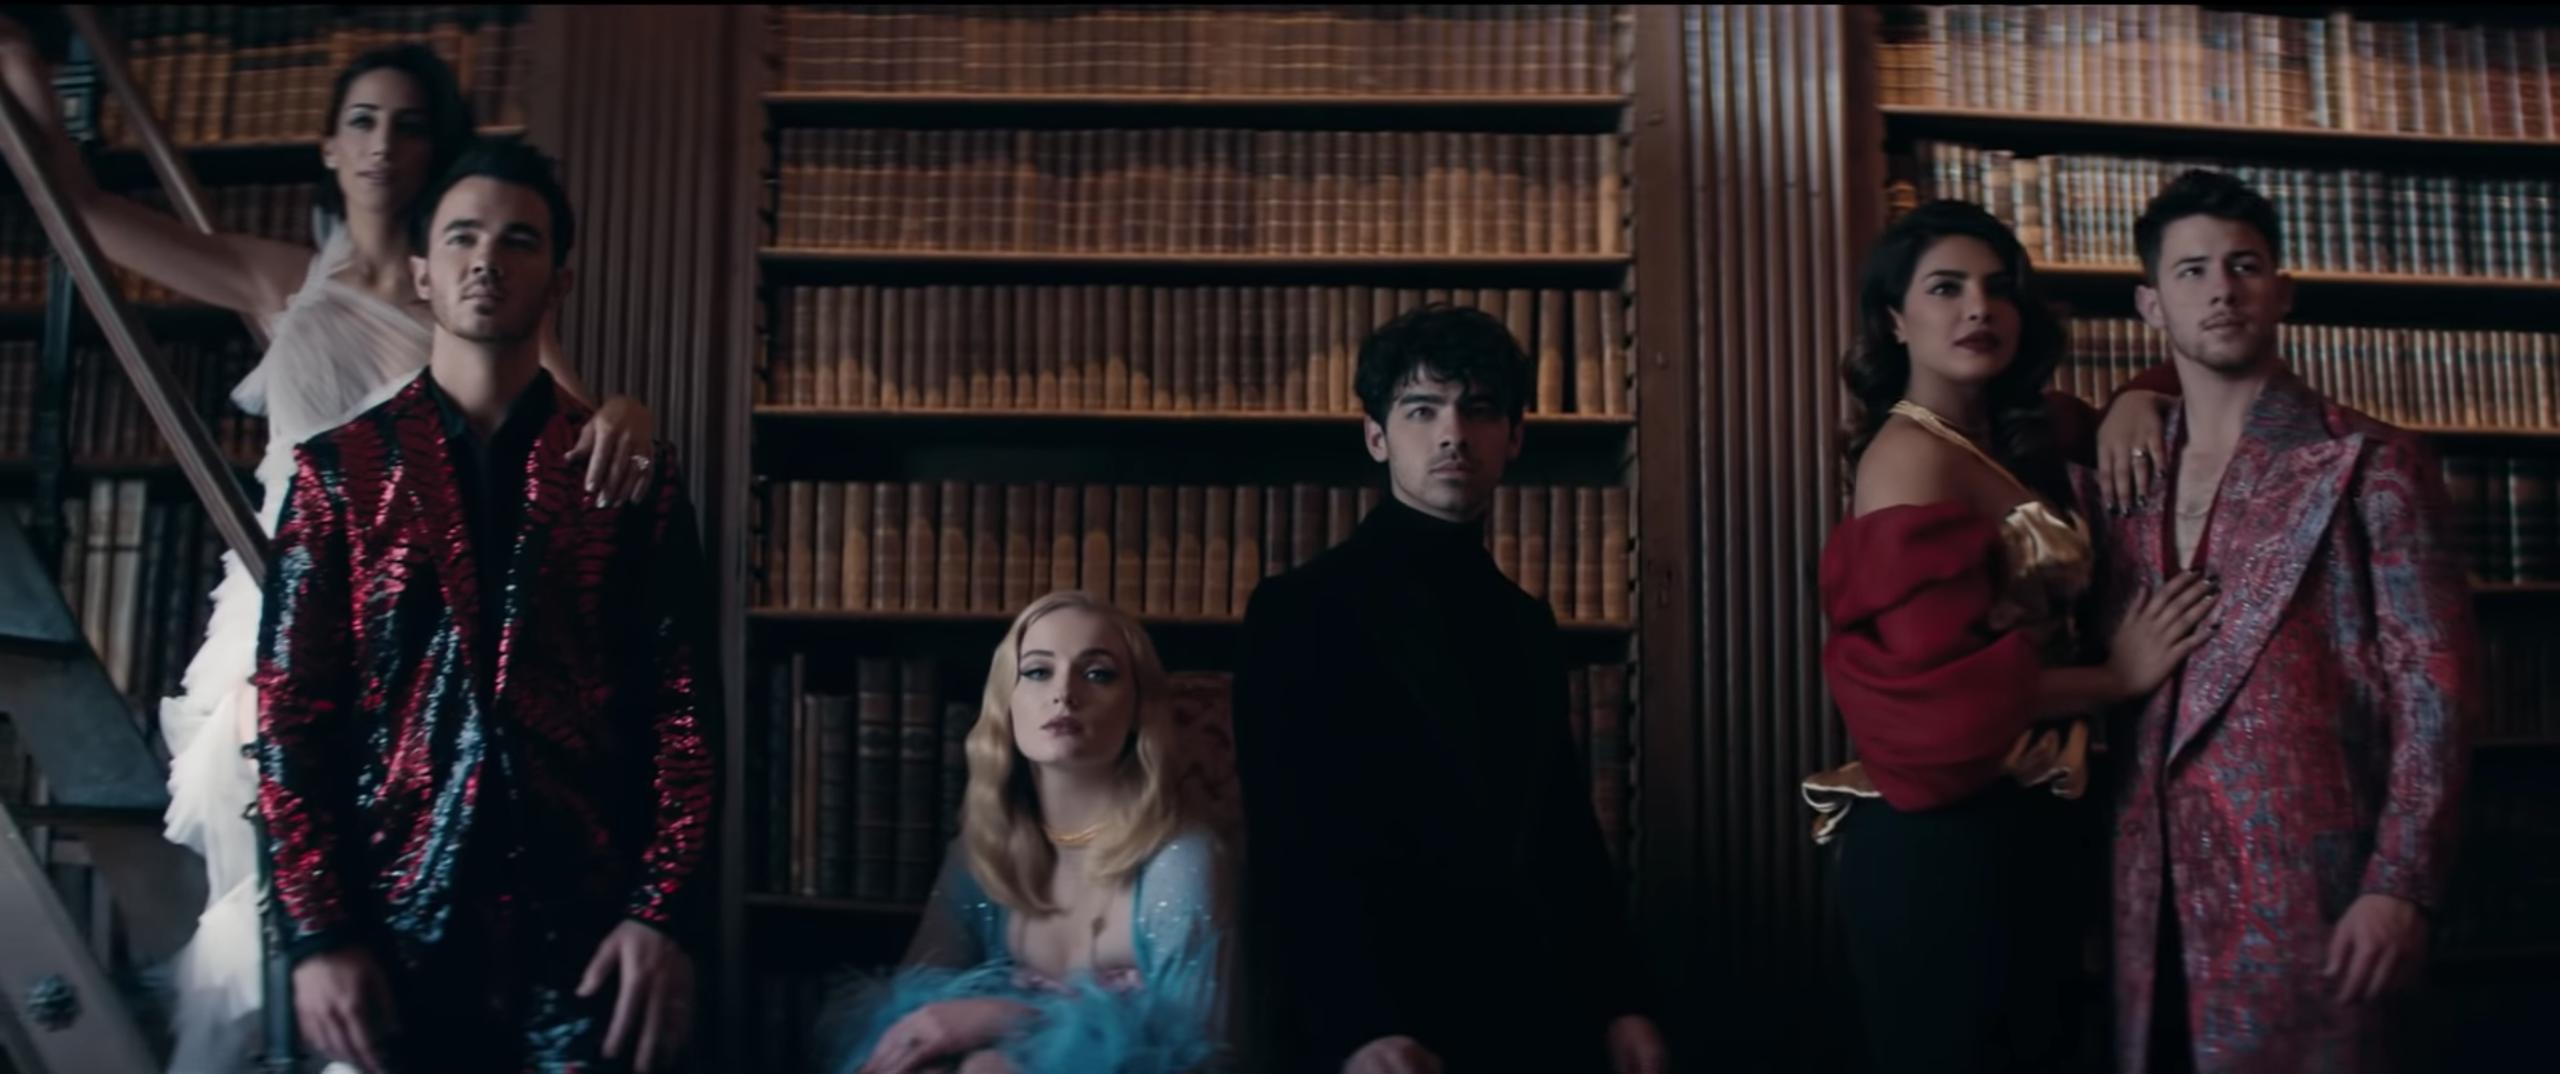 jonas brothers music video